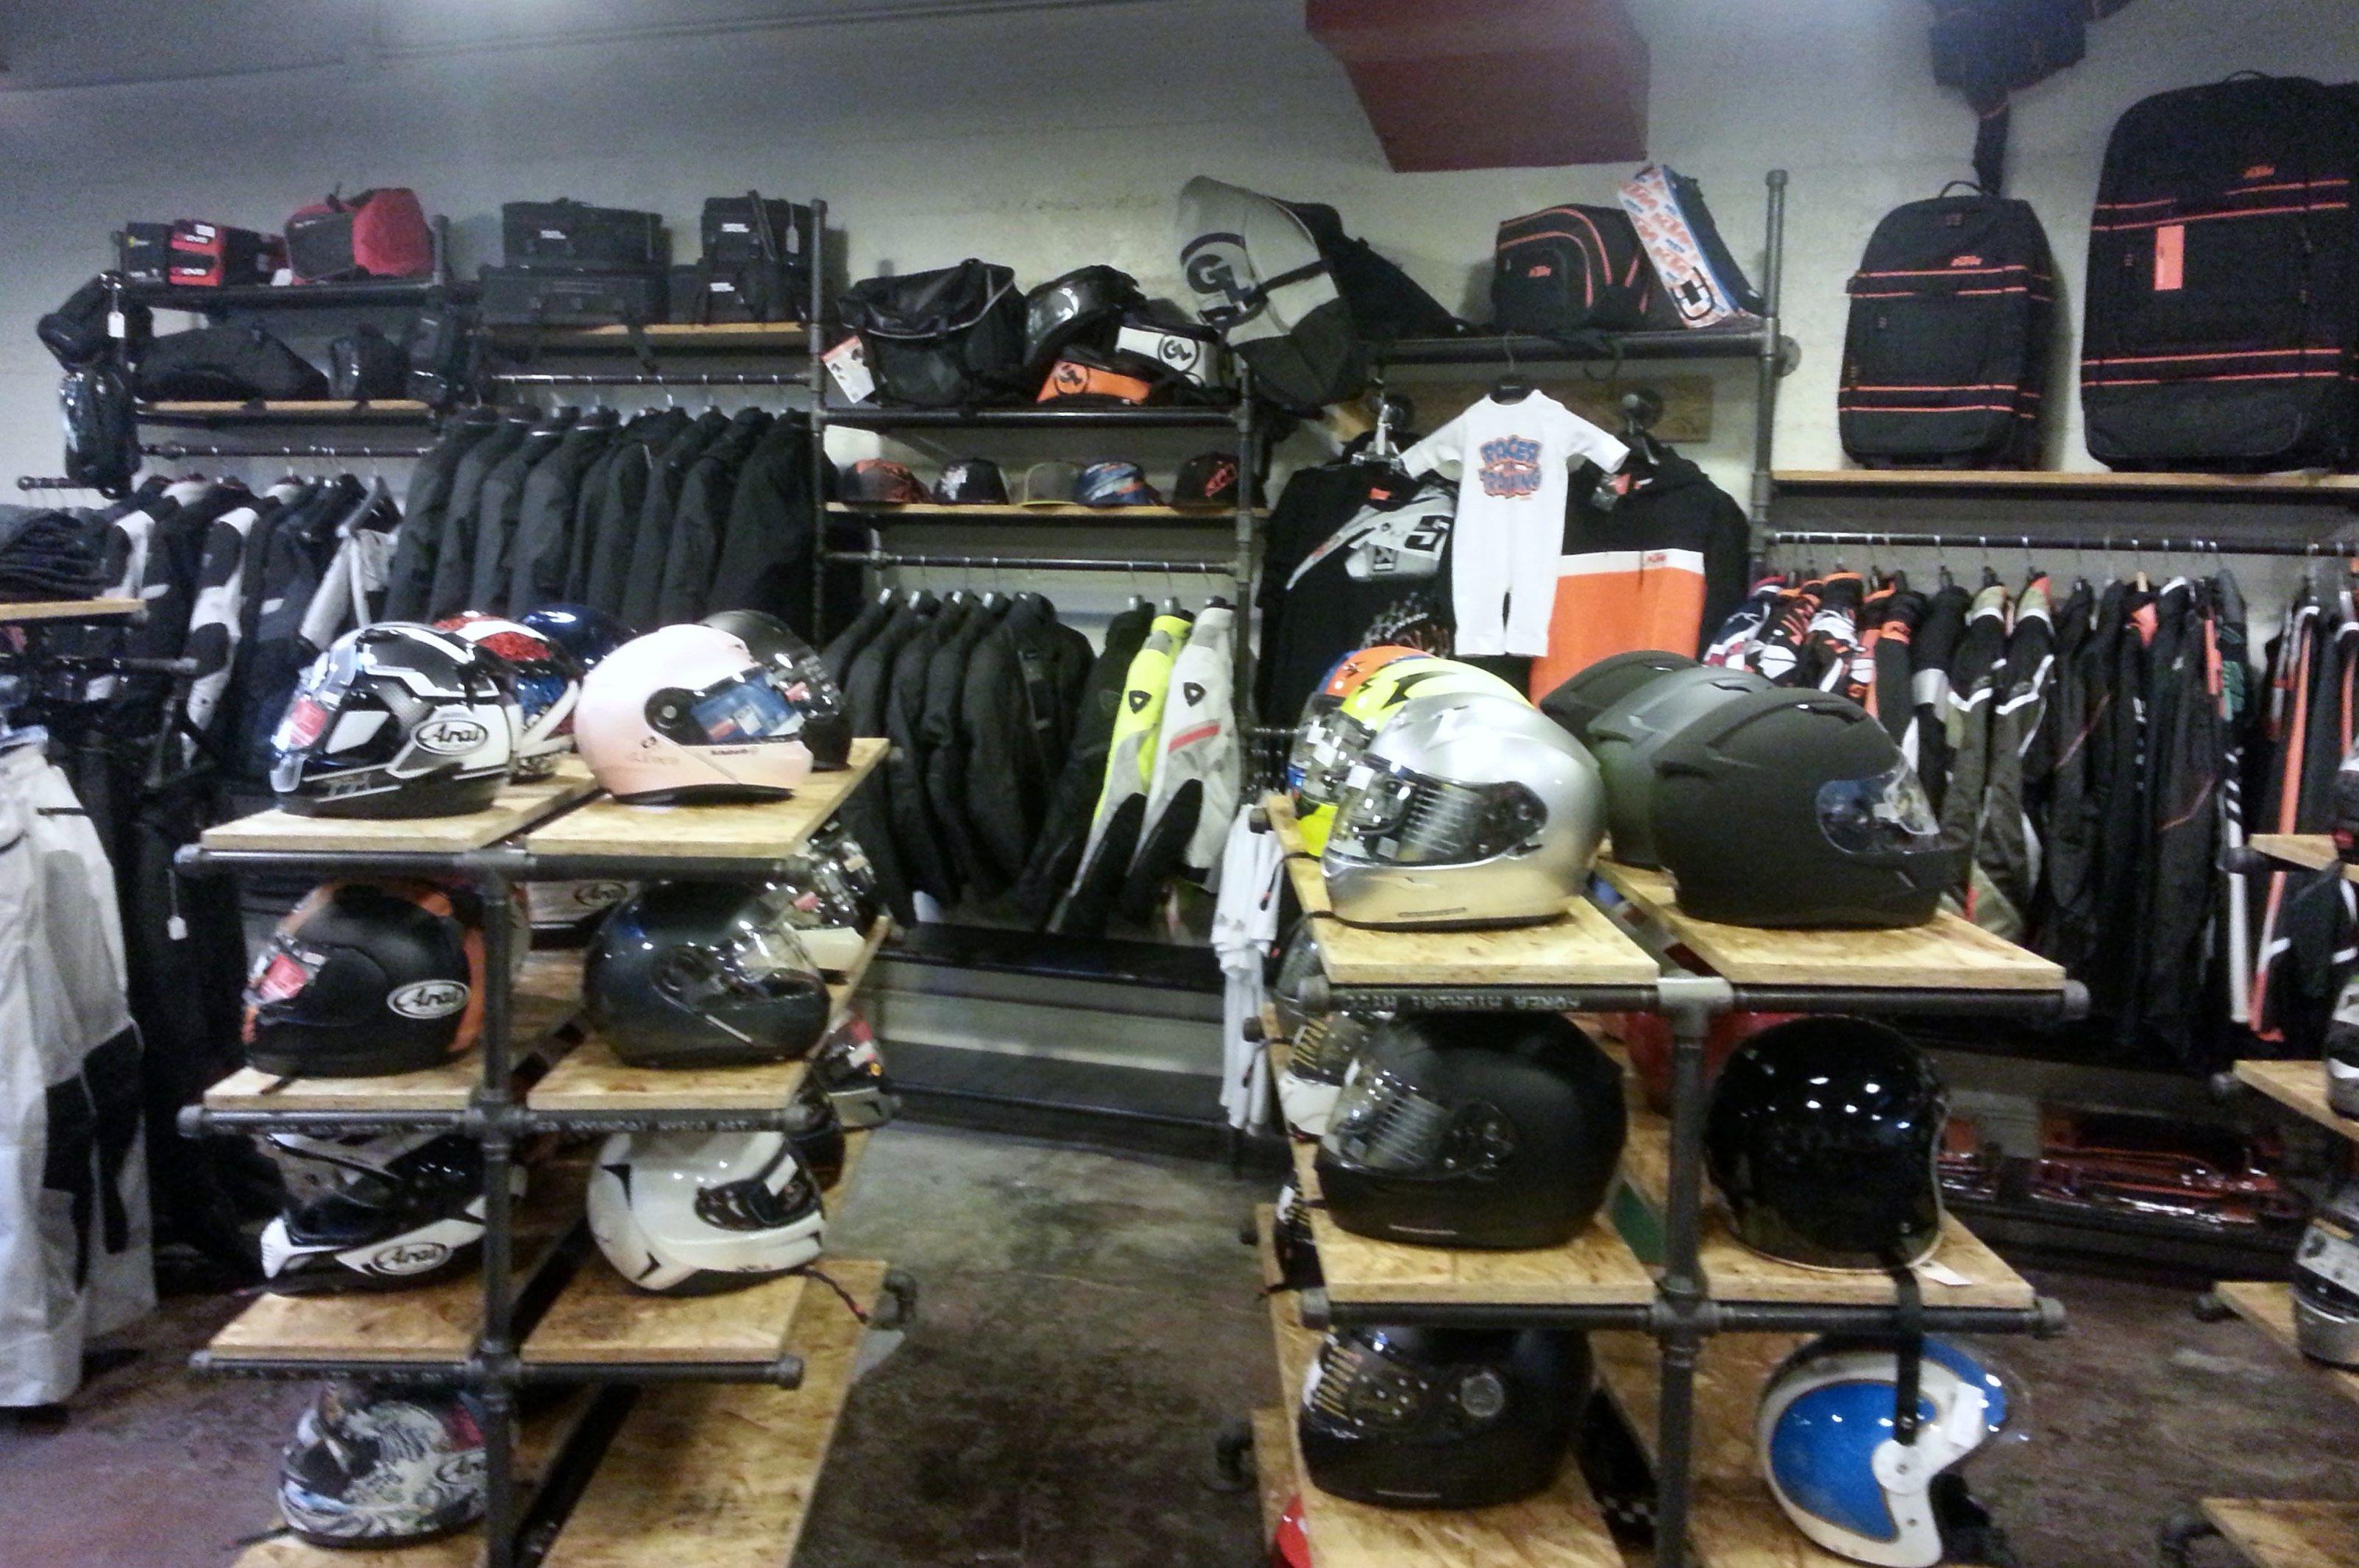 motorcycle shop business plan